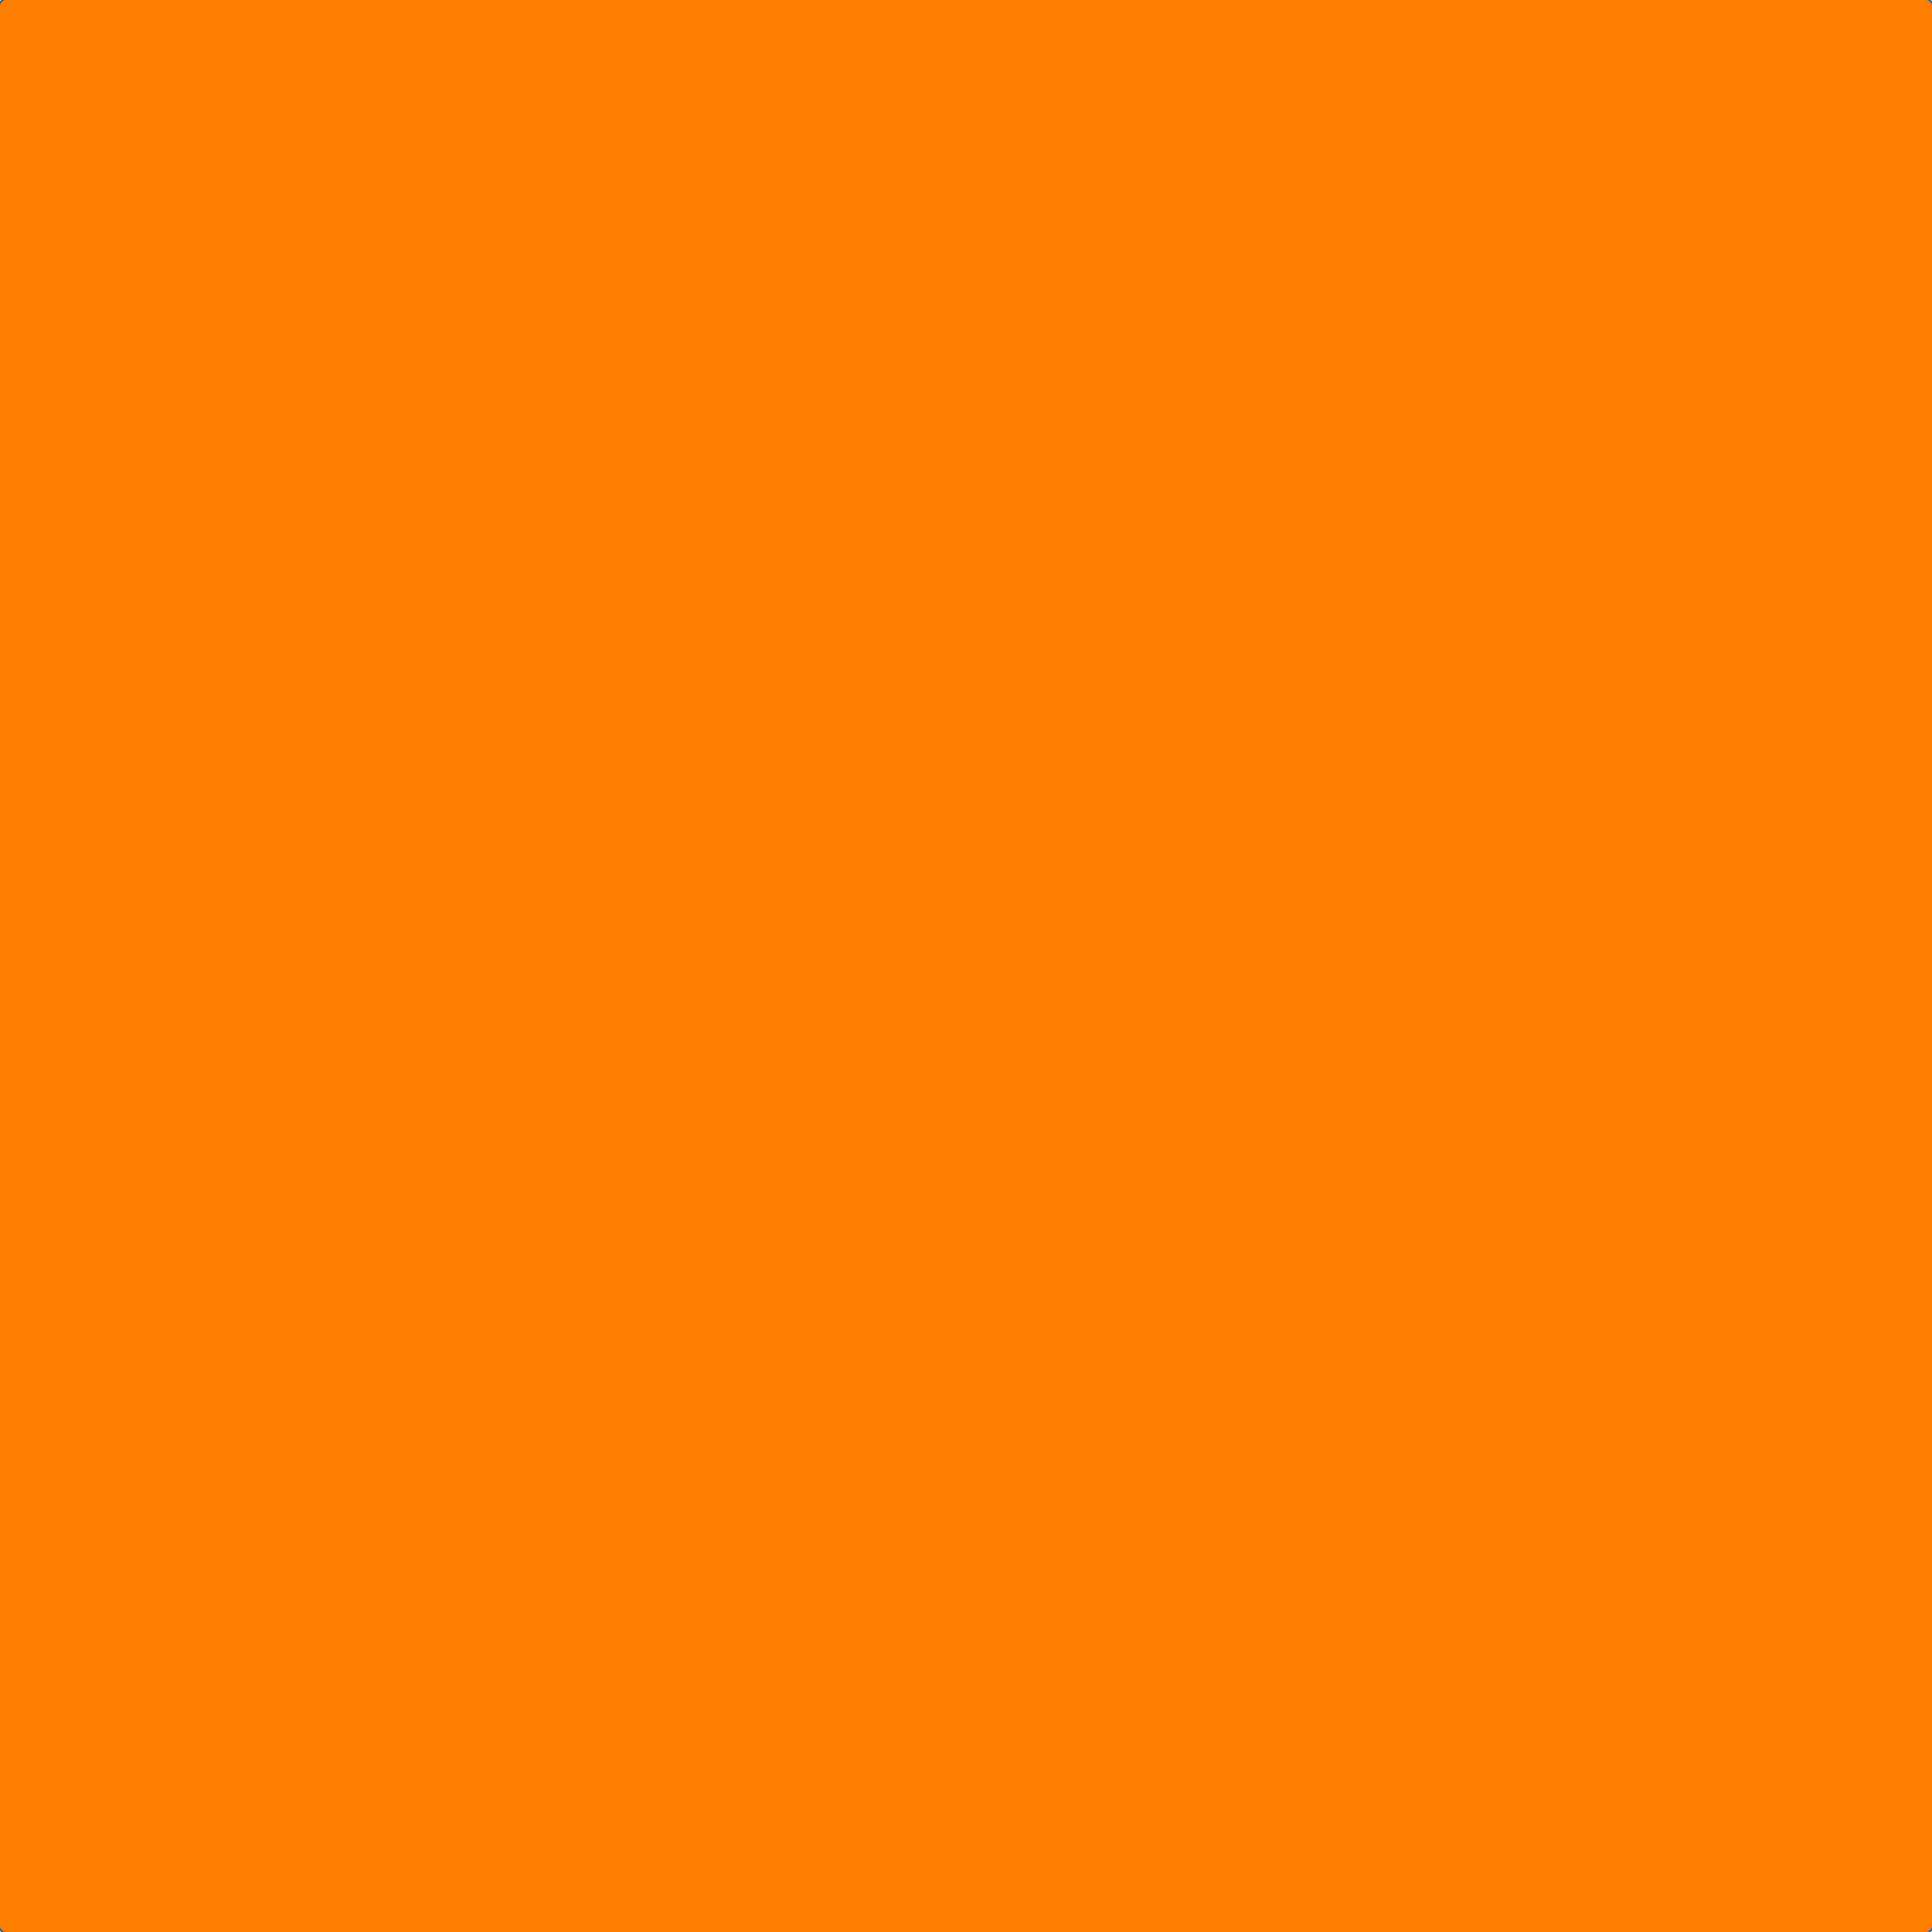 Neon Orange Background...